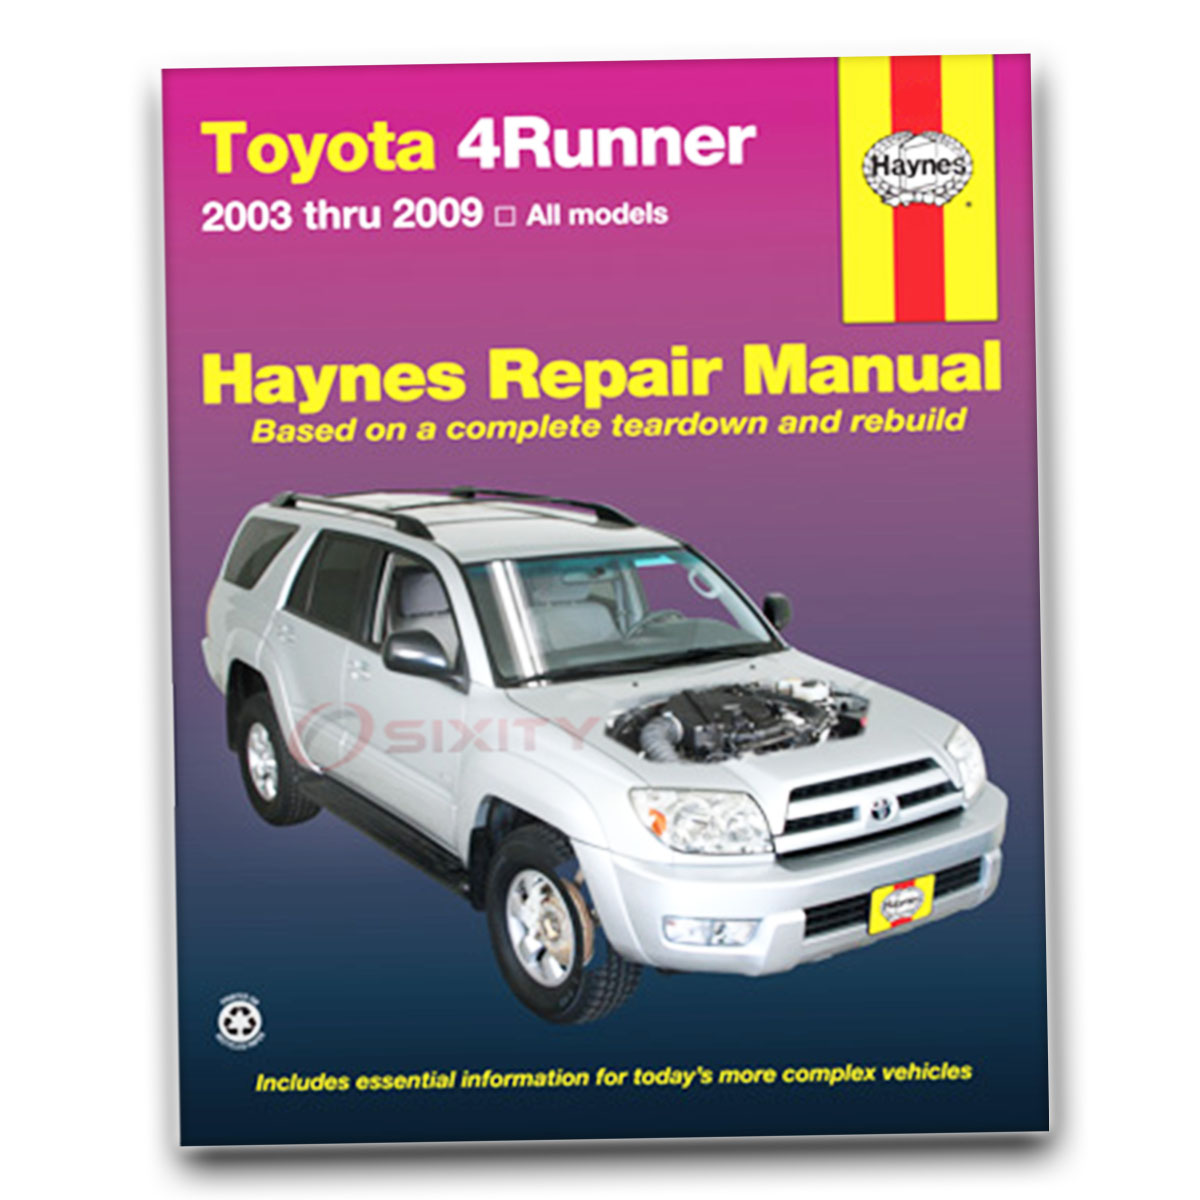 toyota 4runner haynes repair manual sport limited sr5 shop service rh ebay com 2004 4runner repair manual pdf 2004 4runner repair manual free